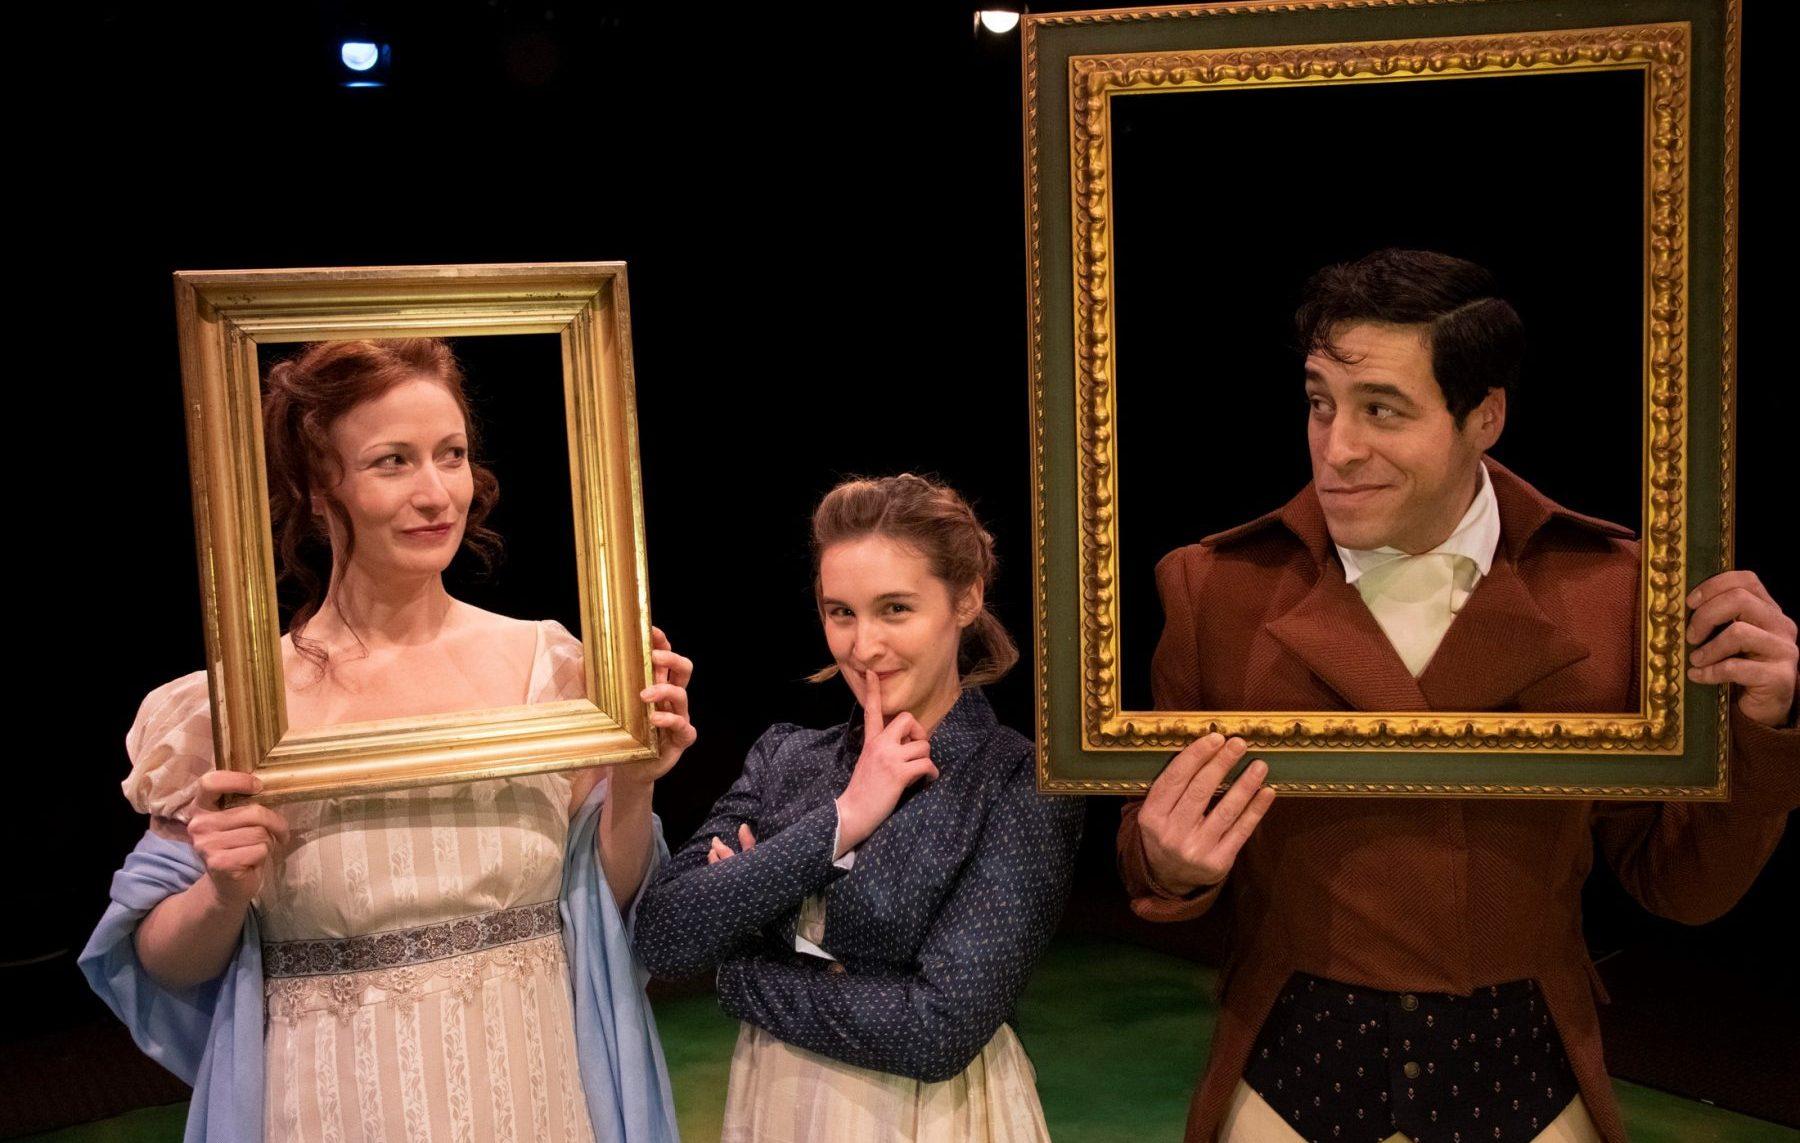 Anthony Chase: Irish Classical's 'Sense Sensibility' is Jane Austen through a kaleidoscope